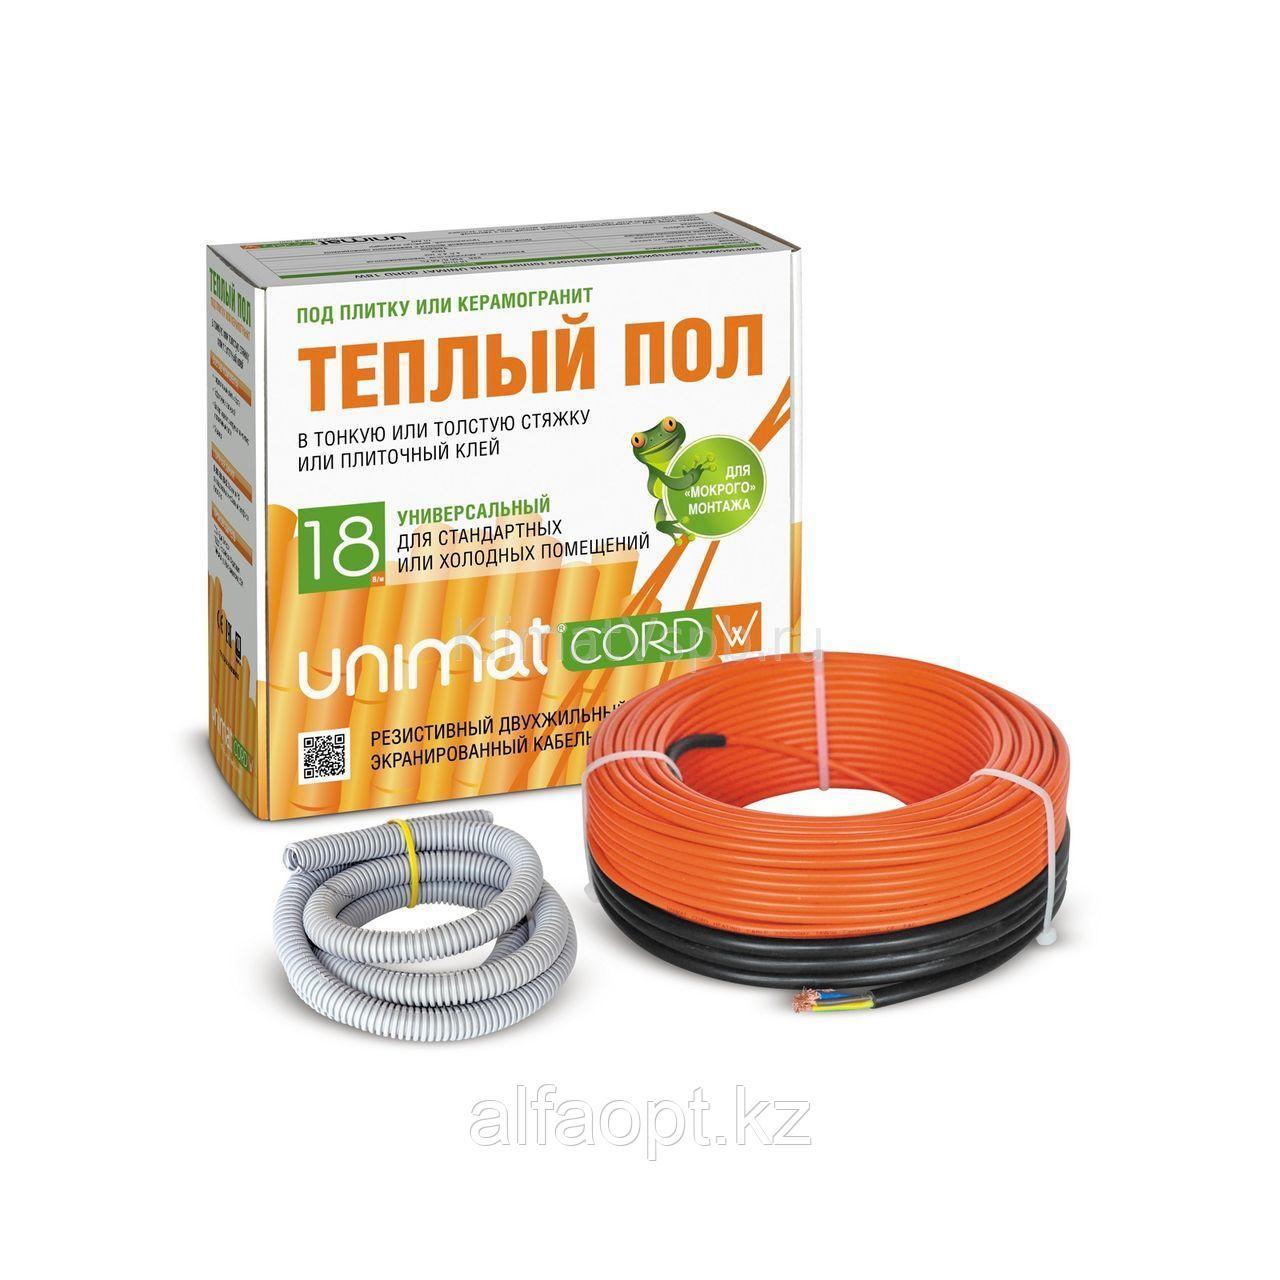 Комплект теплого пола Unimat CORD 18W-30